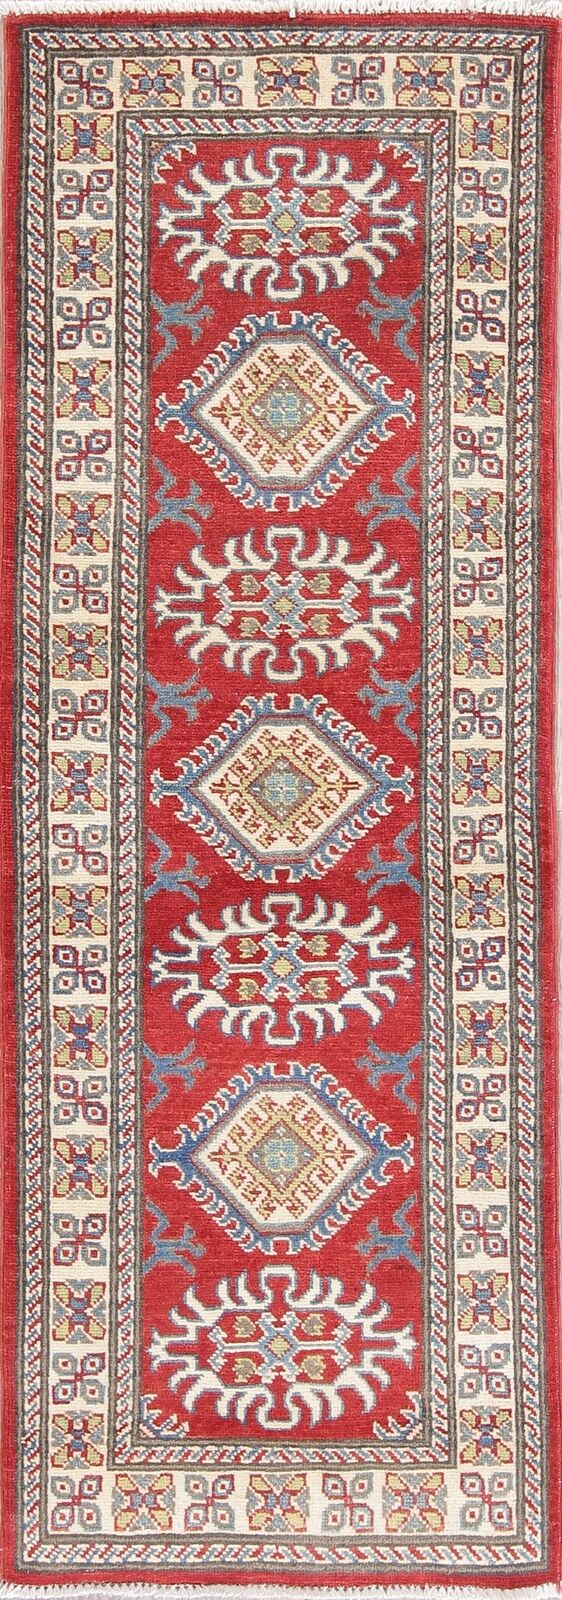 New 6 ft rot & IVORY Runner Kazak Oriental Oriental Oriental Rug Geometric Wool Carpet 2' x 6' 7c4be9